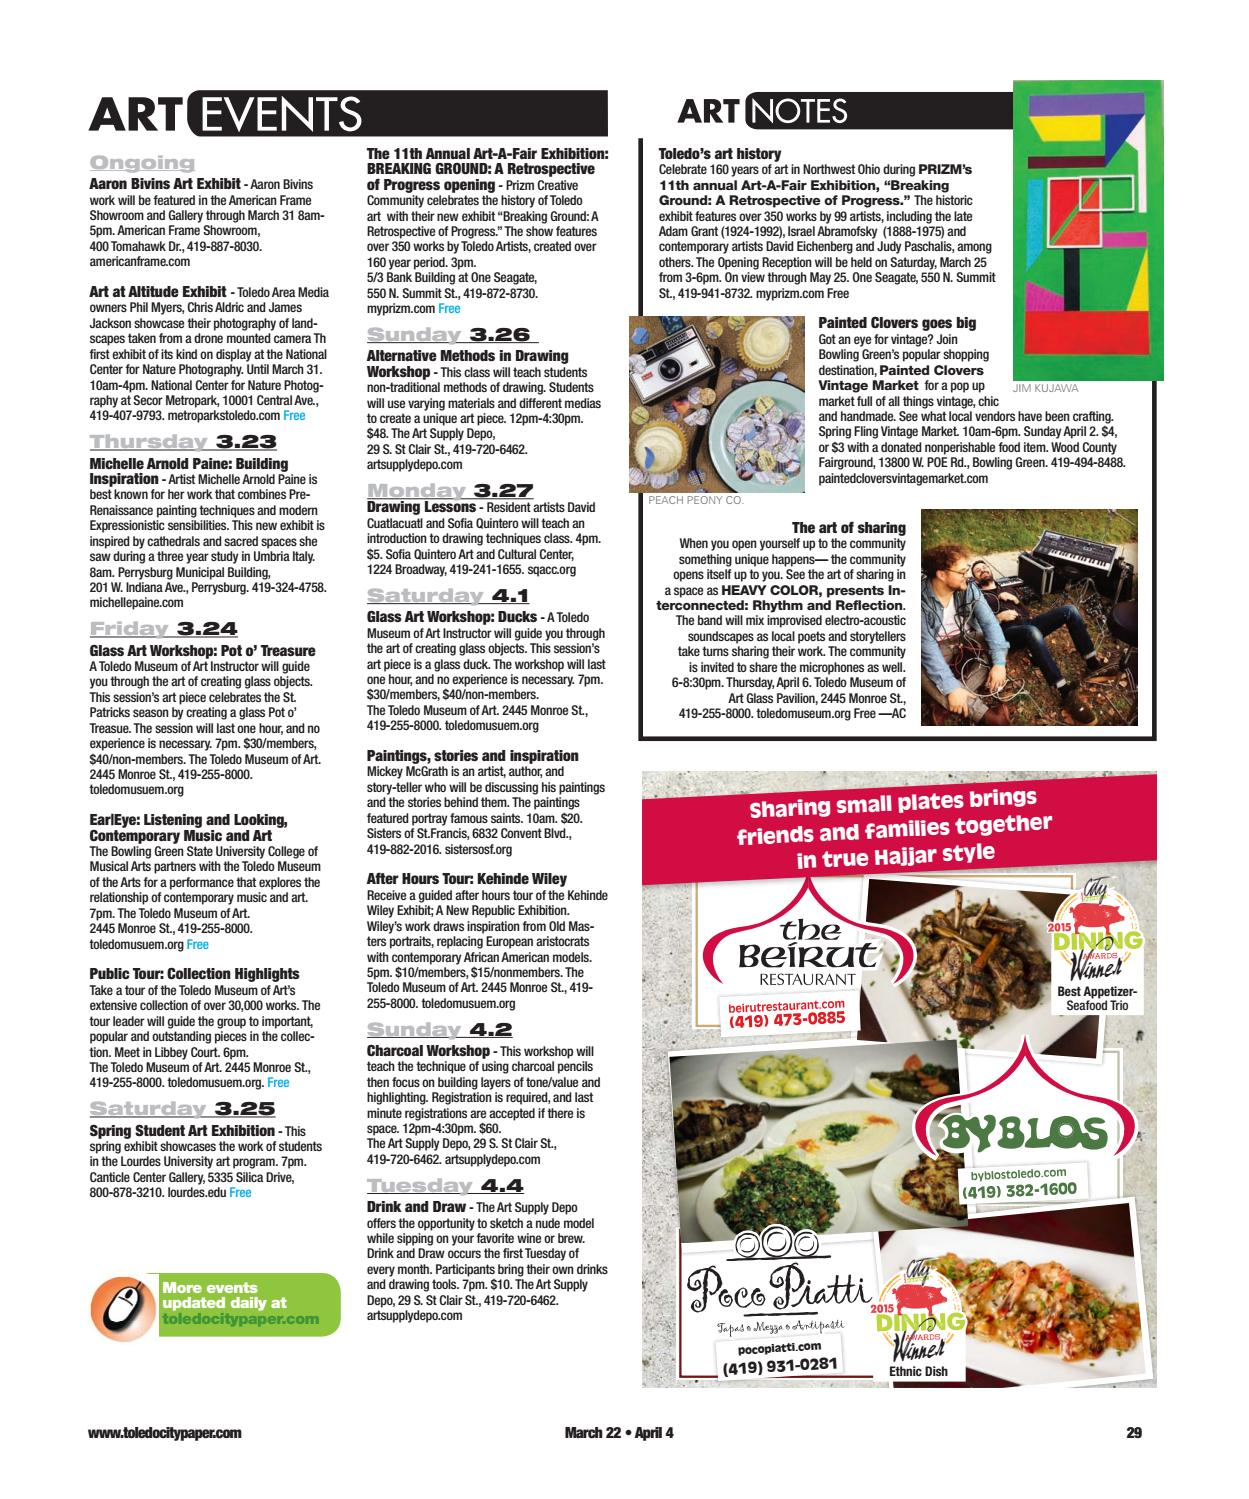 3 22 17 toledo city paper by adams street publishing co issuu